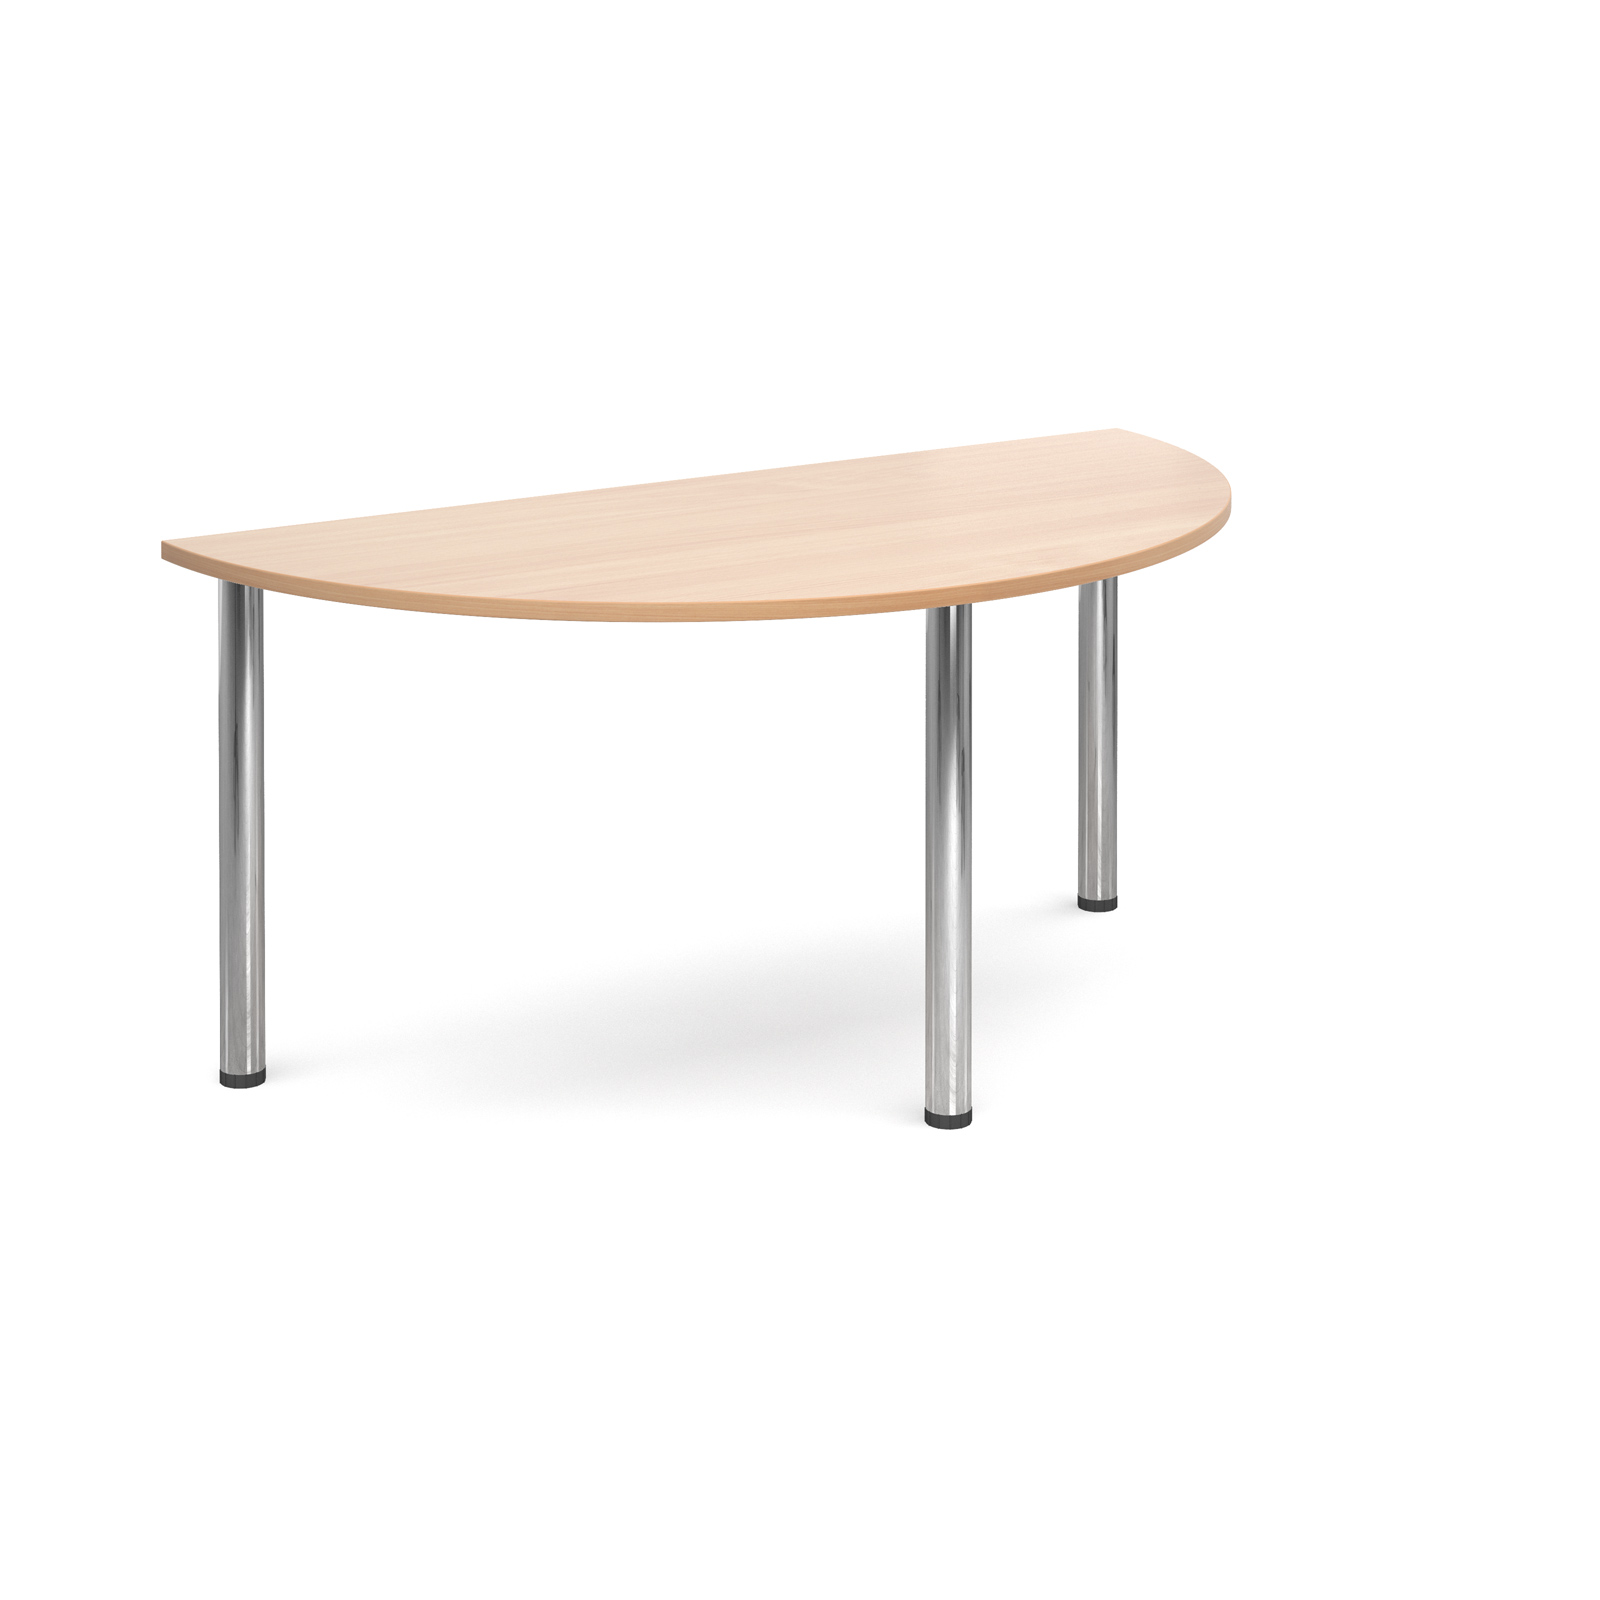 Semi circular deluxe chrome radial leg table 1600mm x 800mm - beech